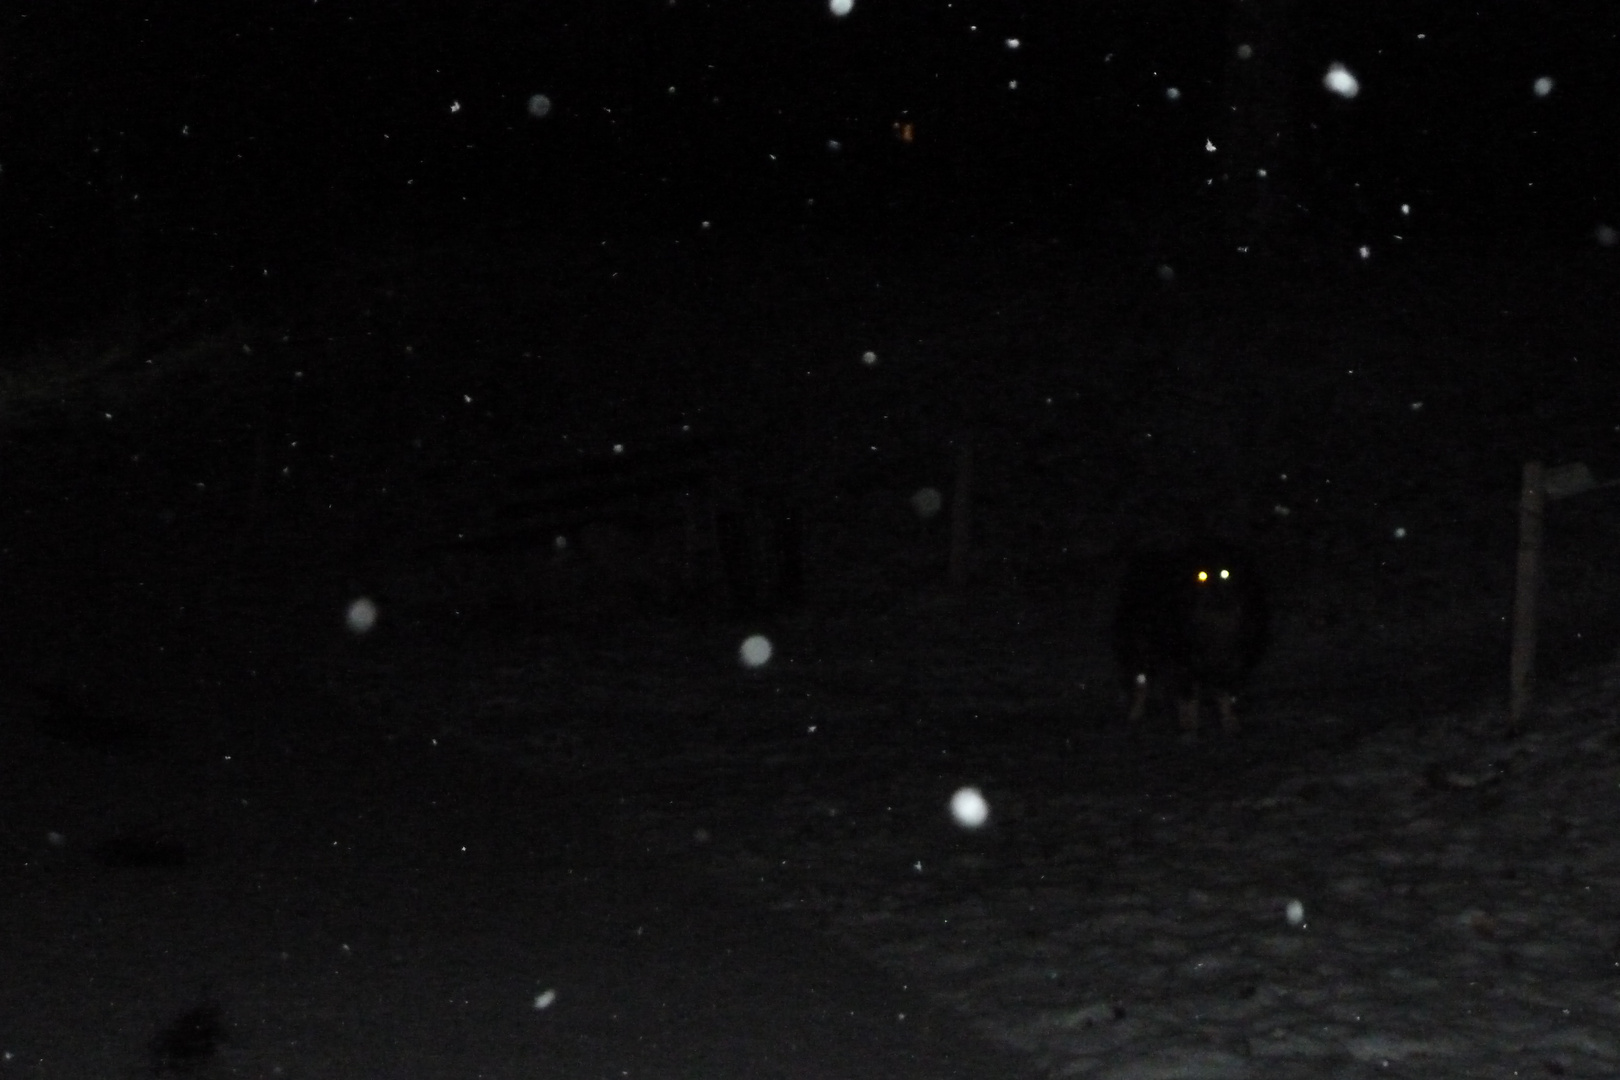 Schneeauge